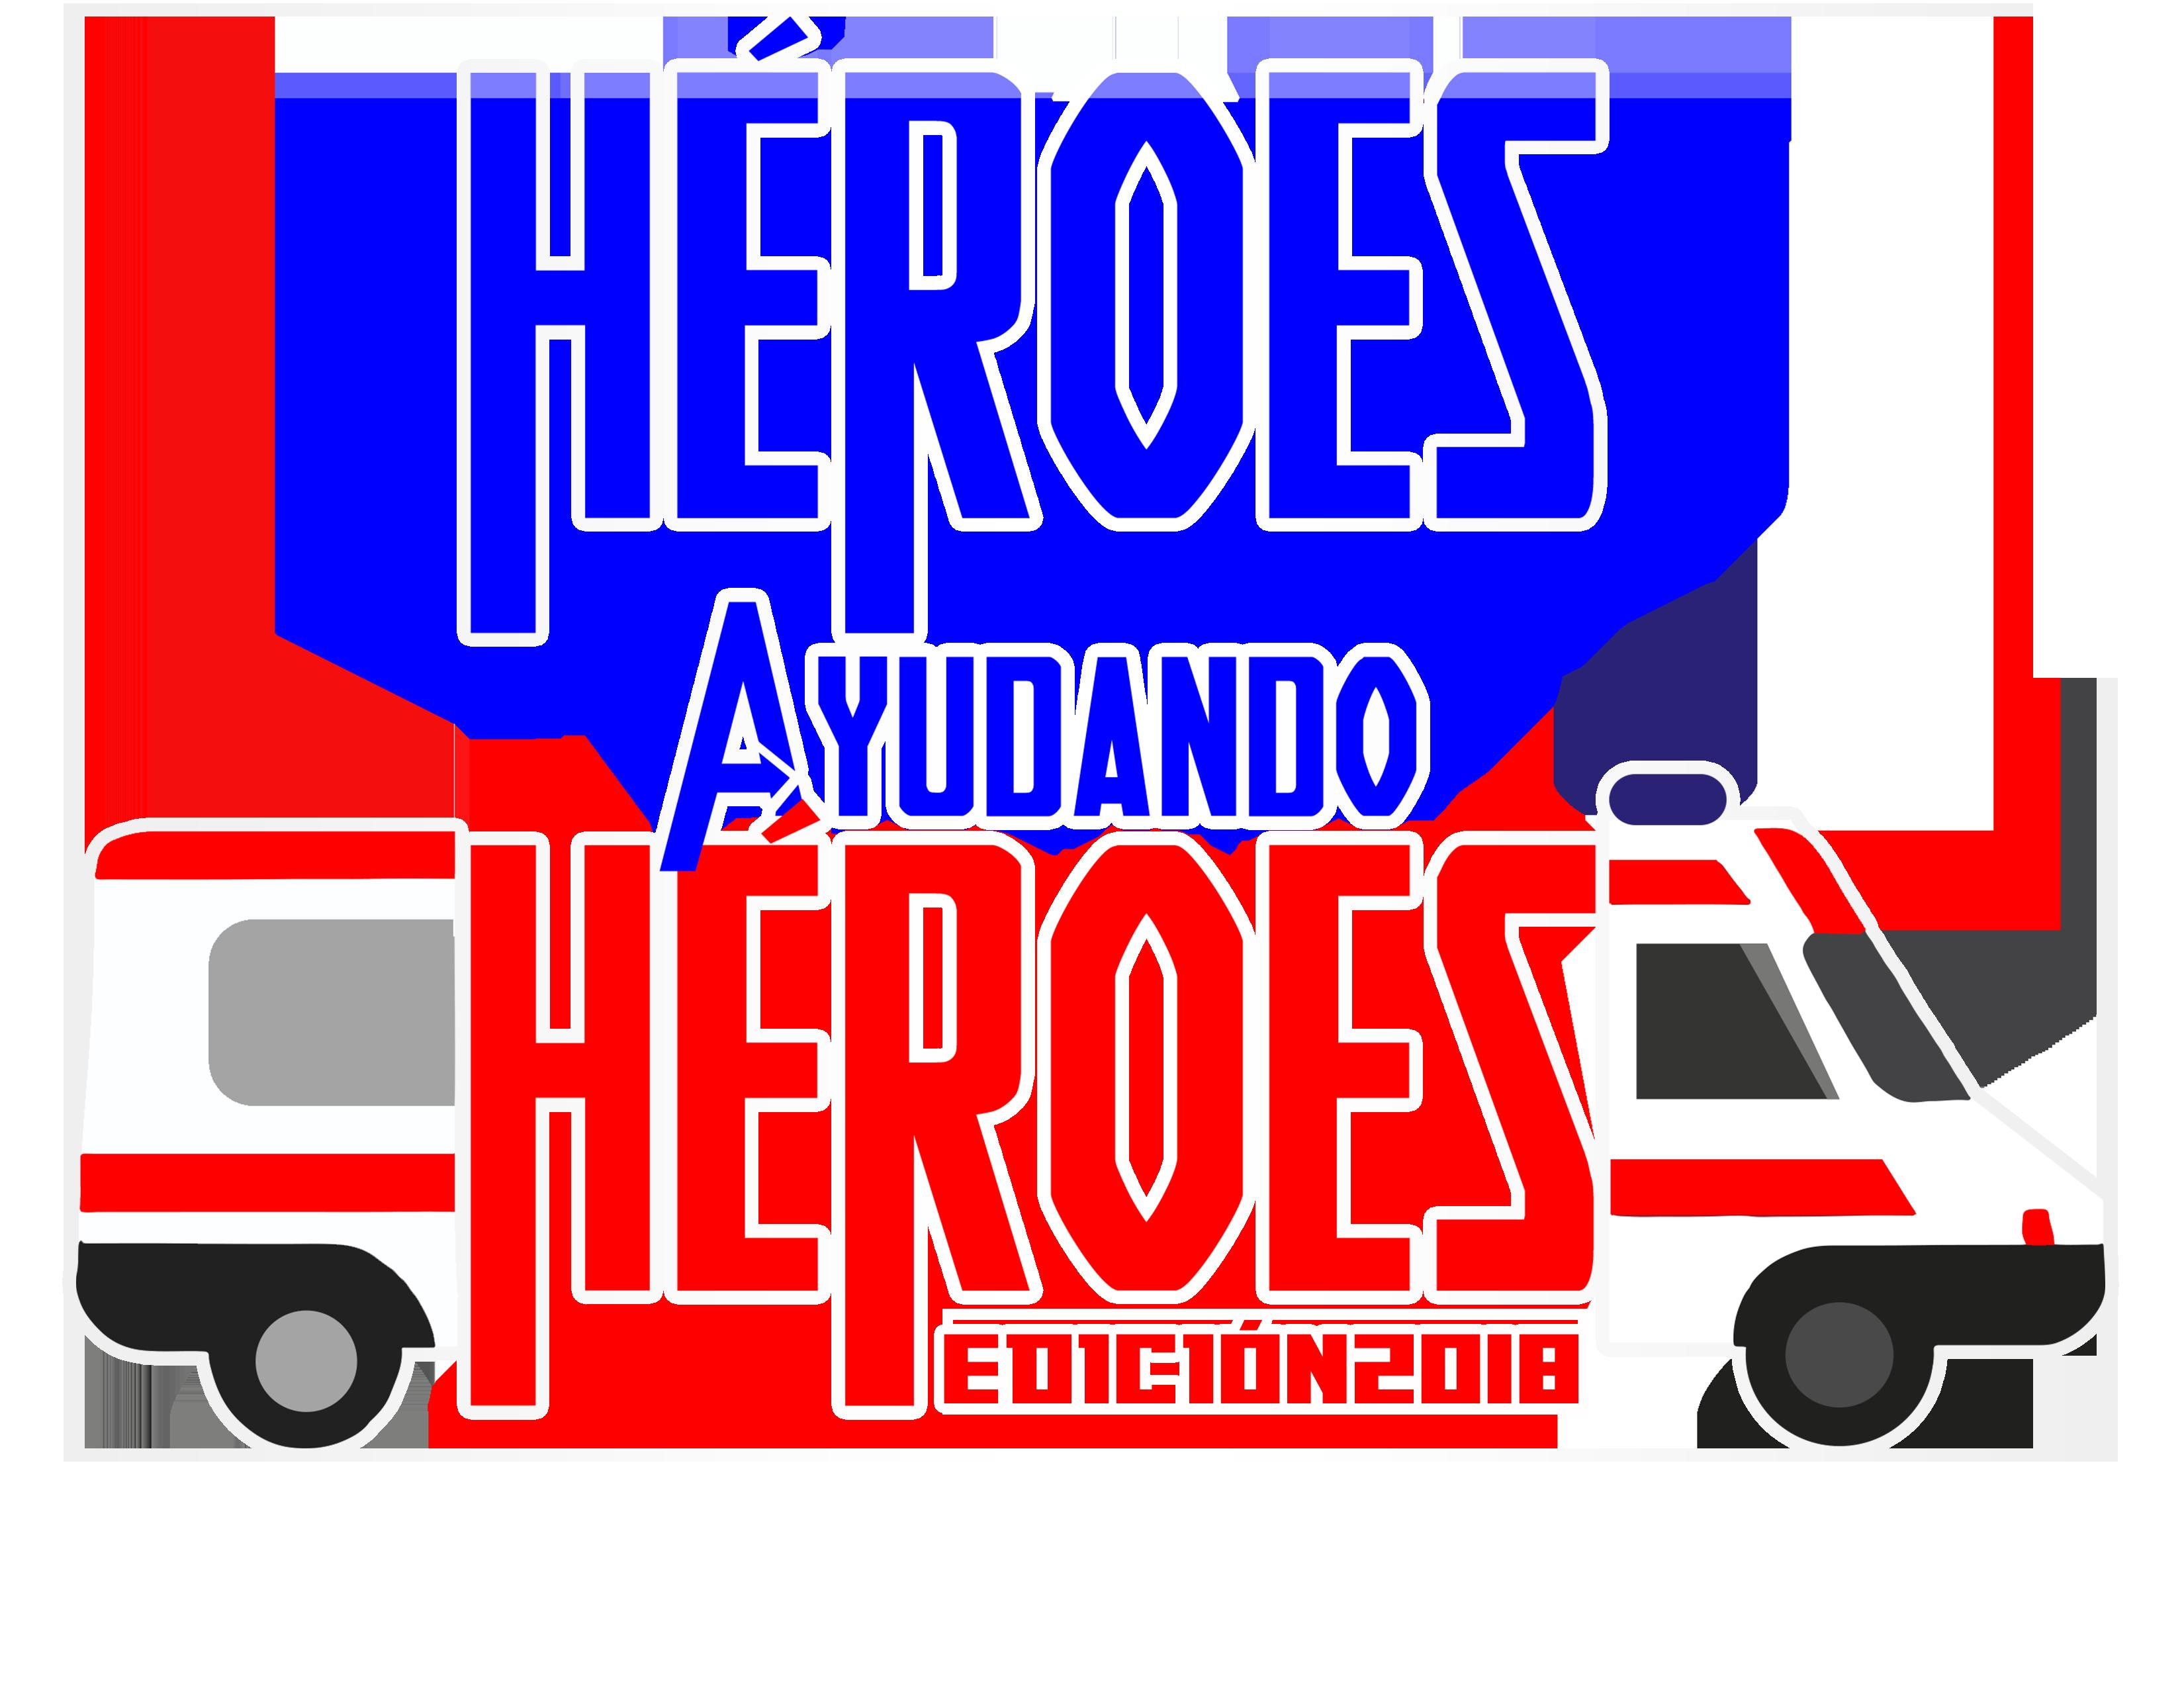 Héroes Ayudando Logo Acquaroni